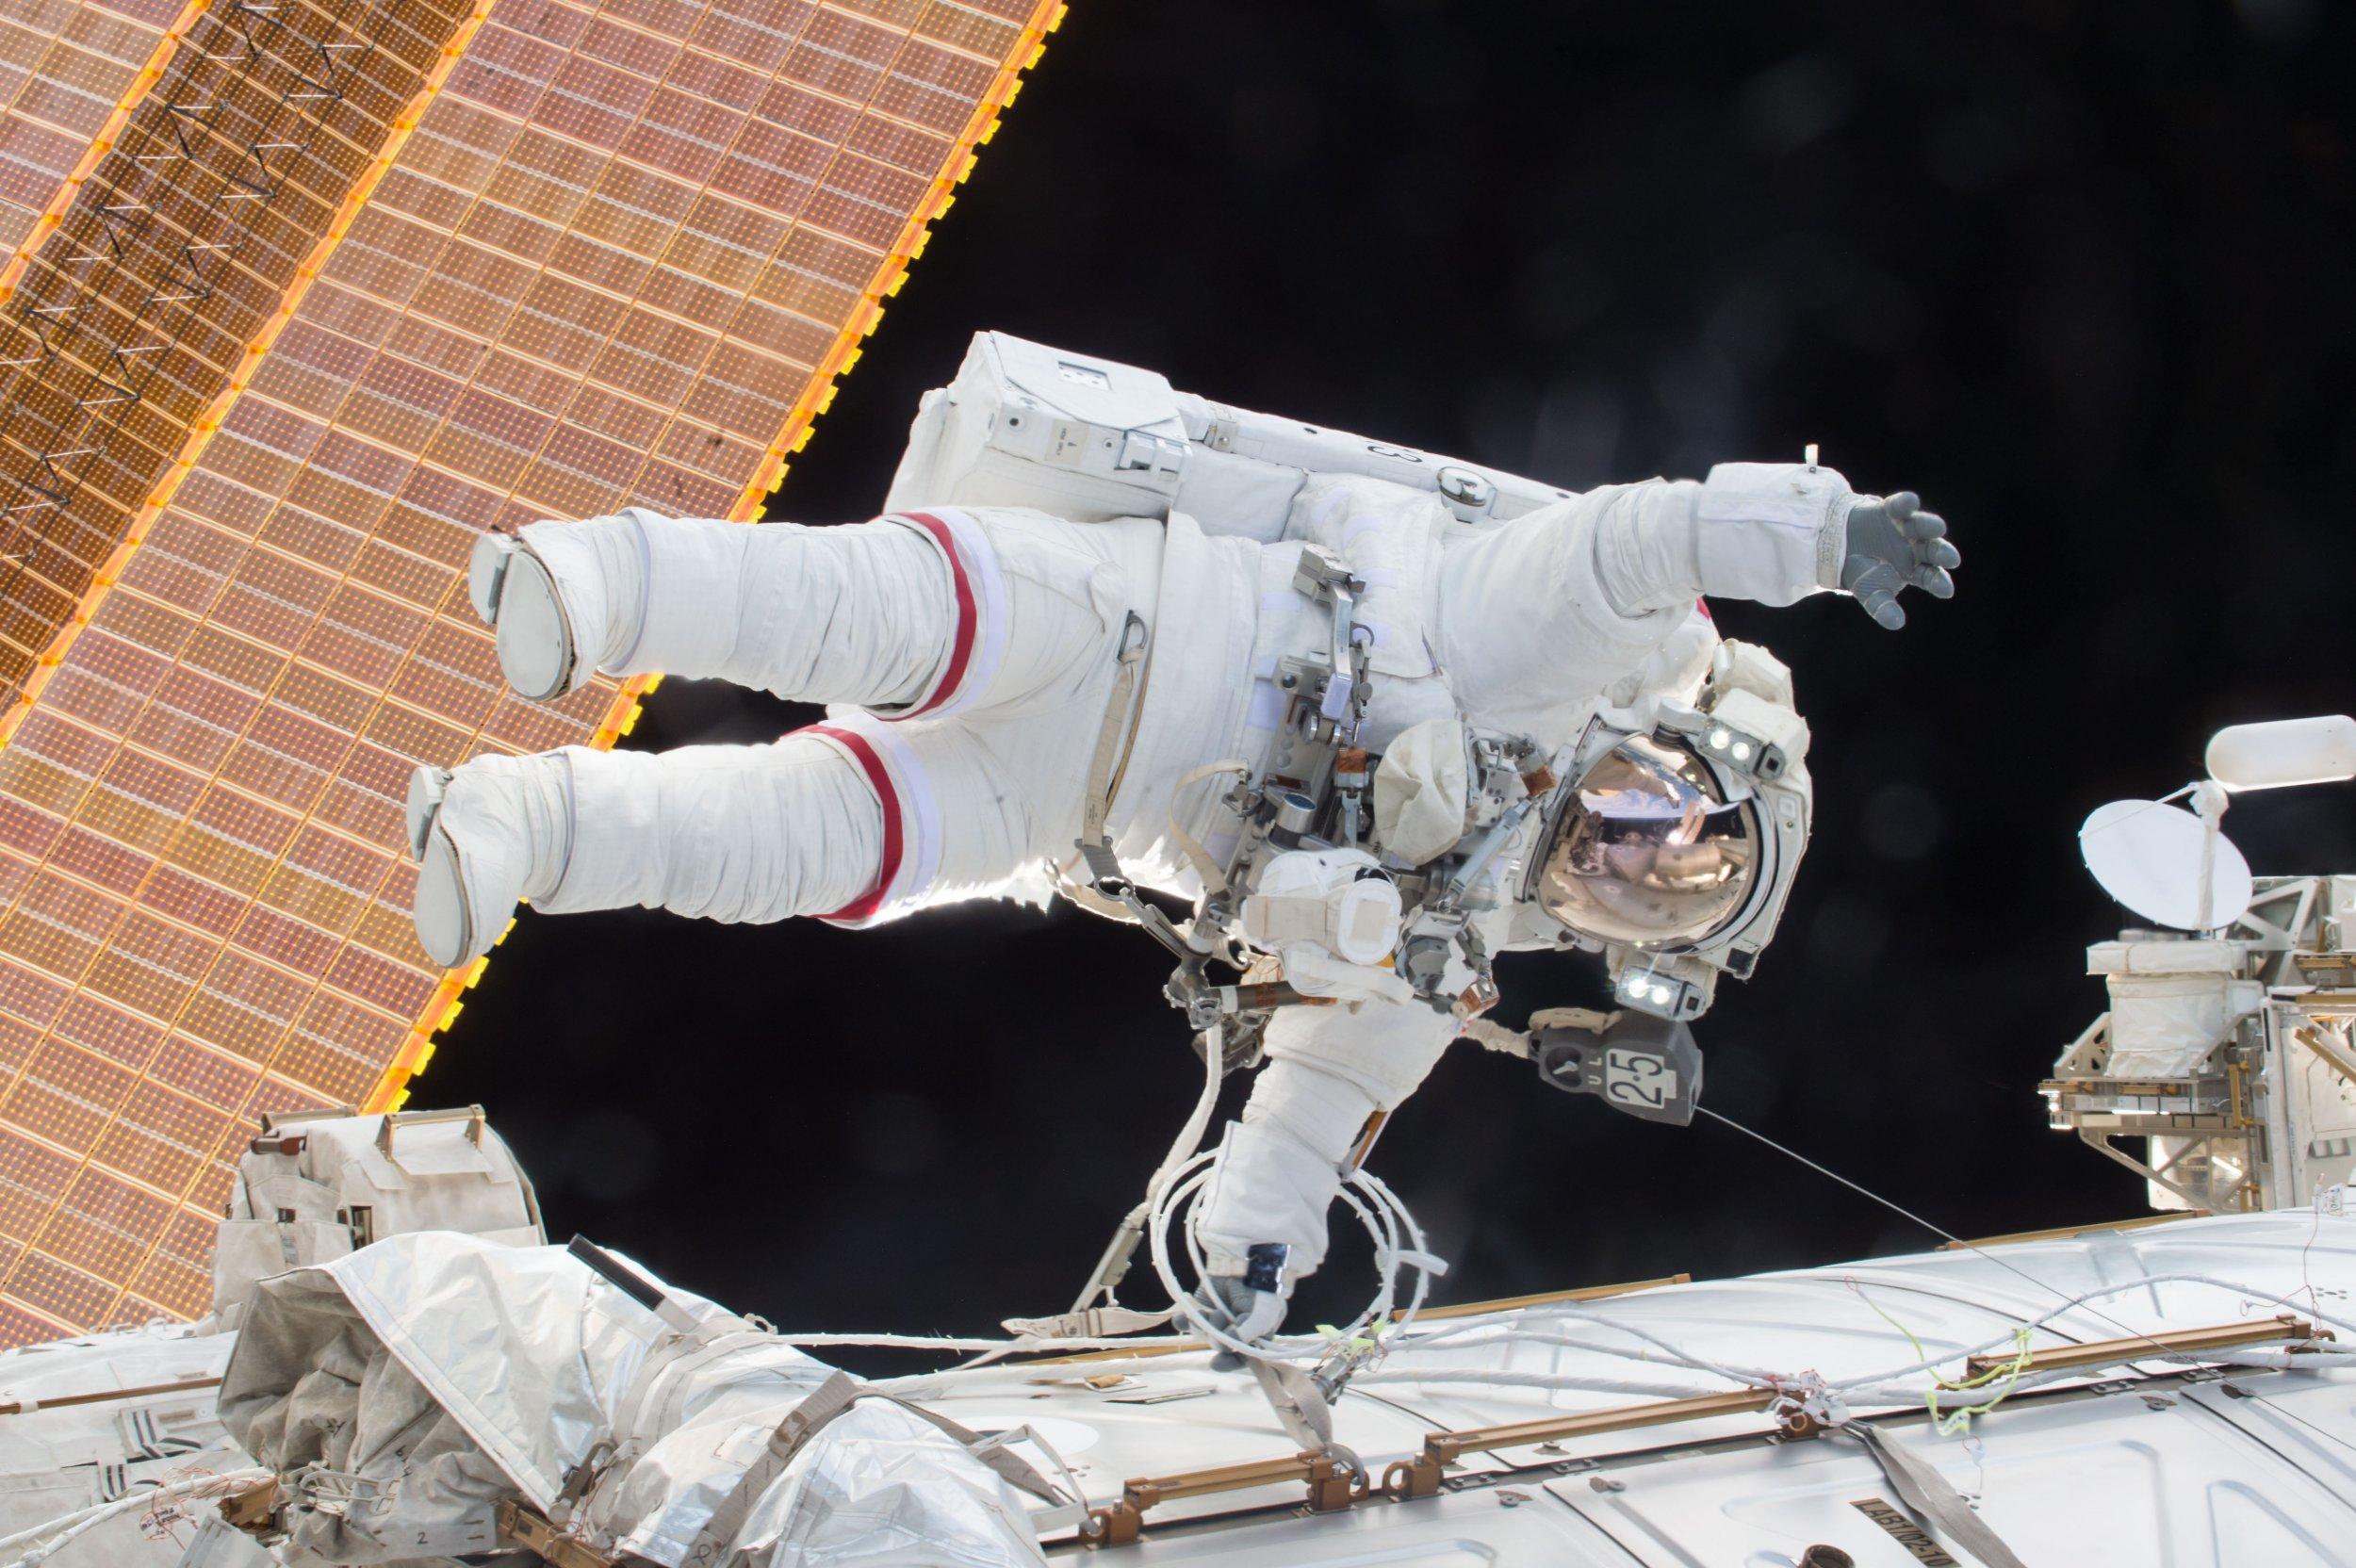 2-22-16 Astronaut